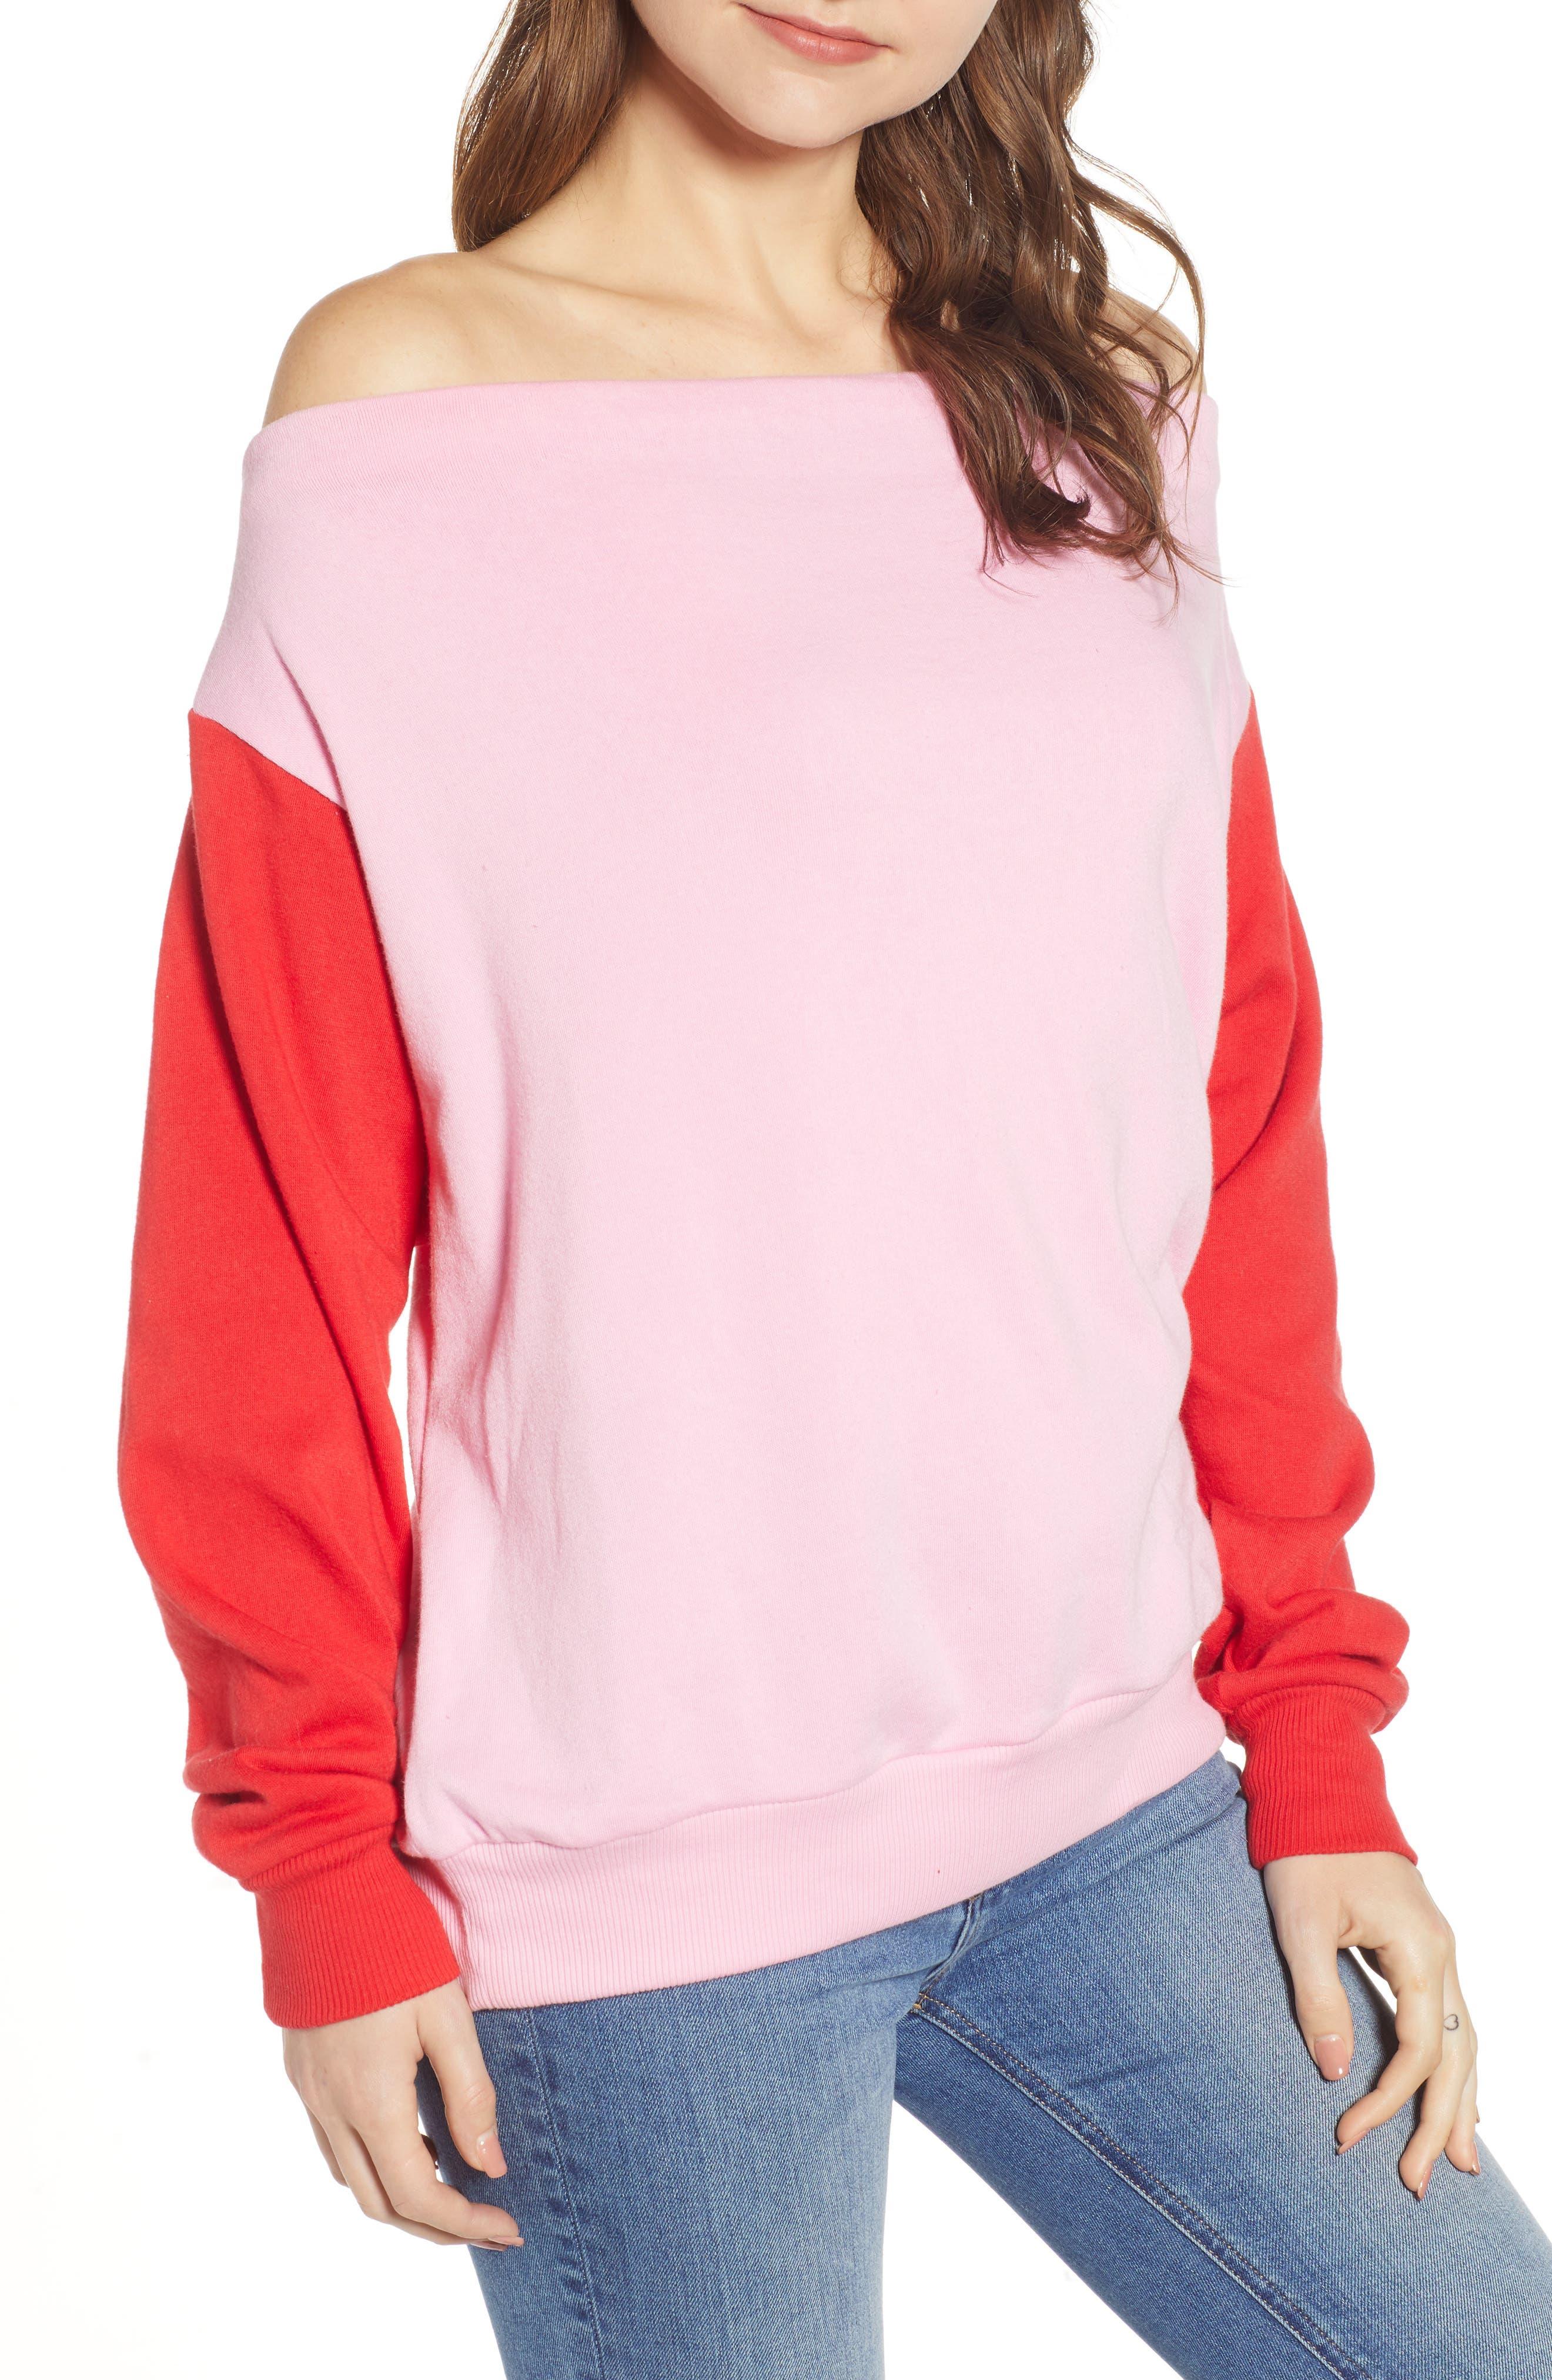 Colorblock Fleece Sweatshirt,                             Main thumbnail 1, color,                             PINK PRISM